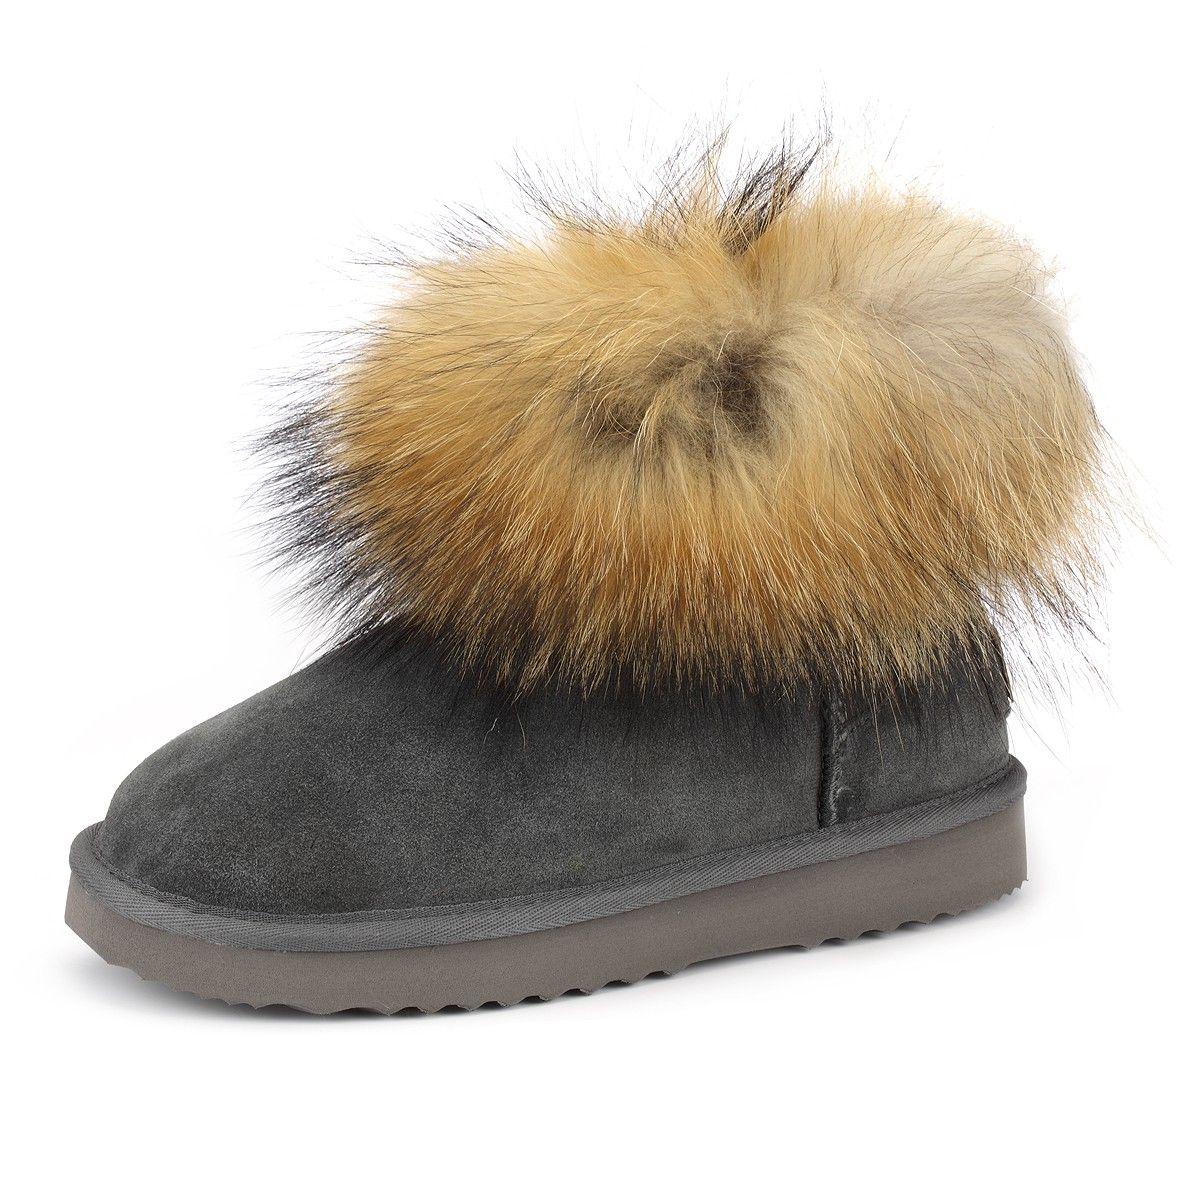 Skutari Boots Wildleder Fell Stiefel Diamant Winter Damen SpMVzU